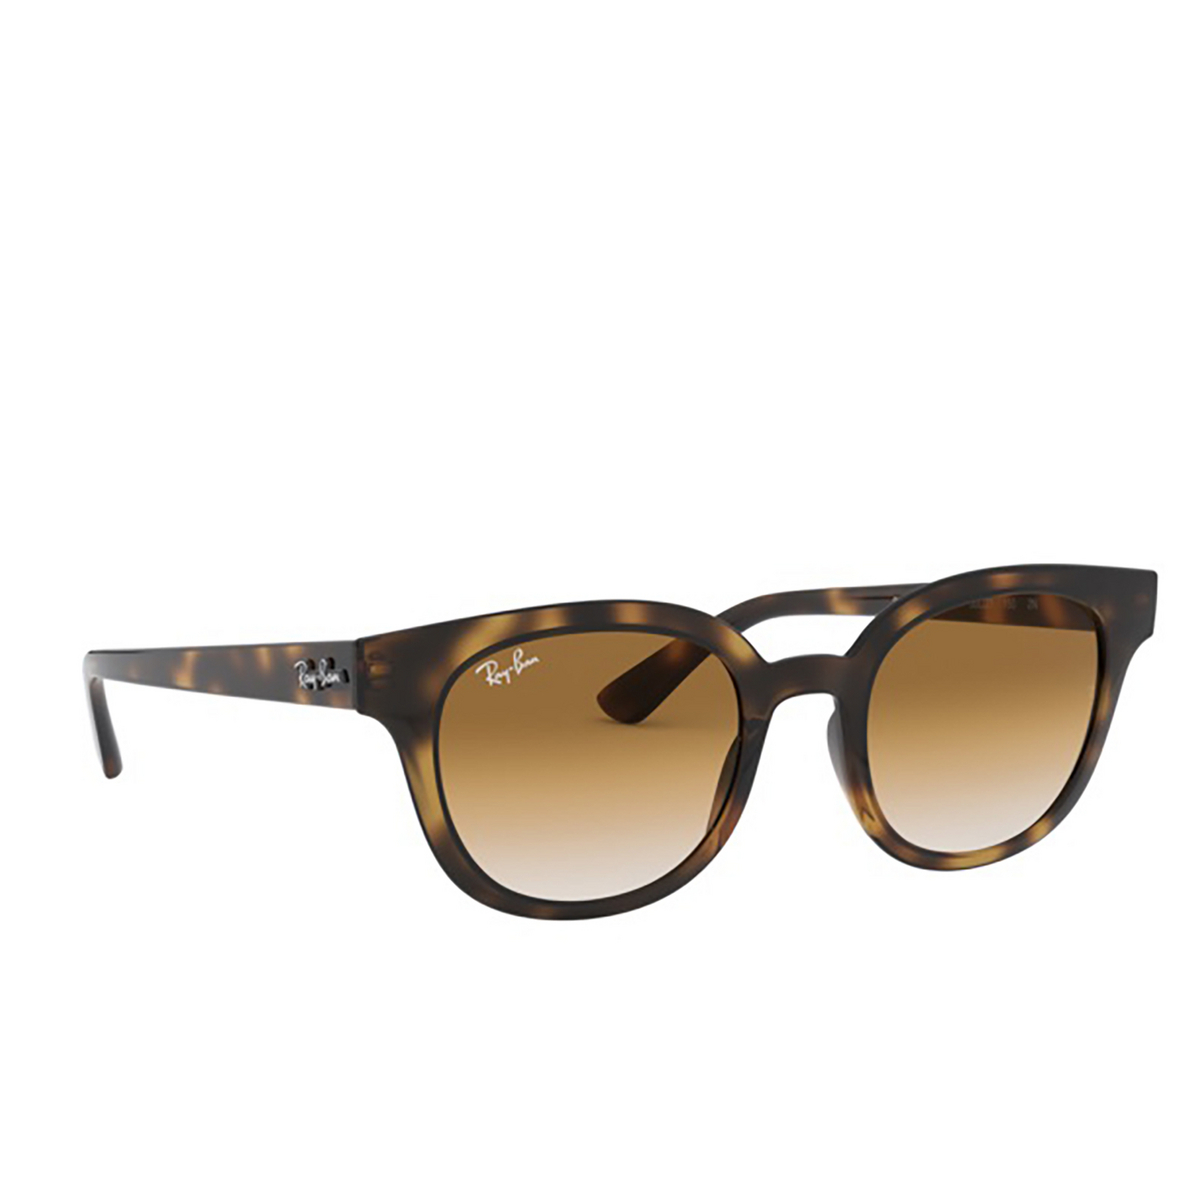 Ray-Ban® Square Sunglasses: RB4324 color Light Havana 710/51 - 2/3.